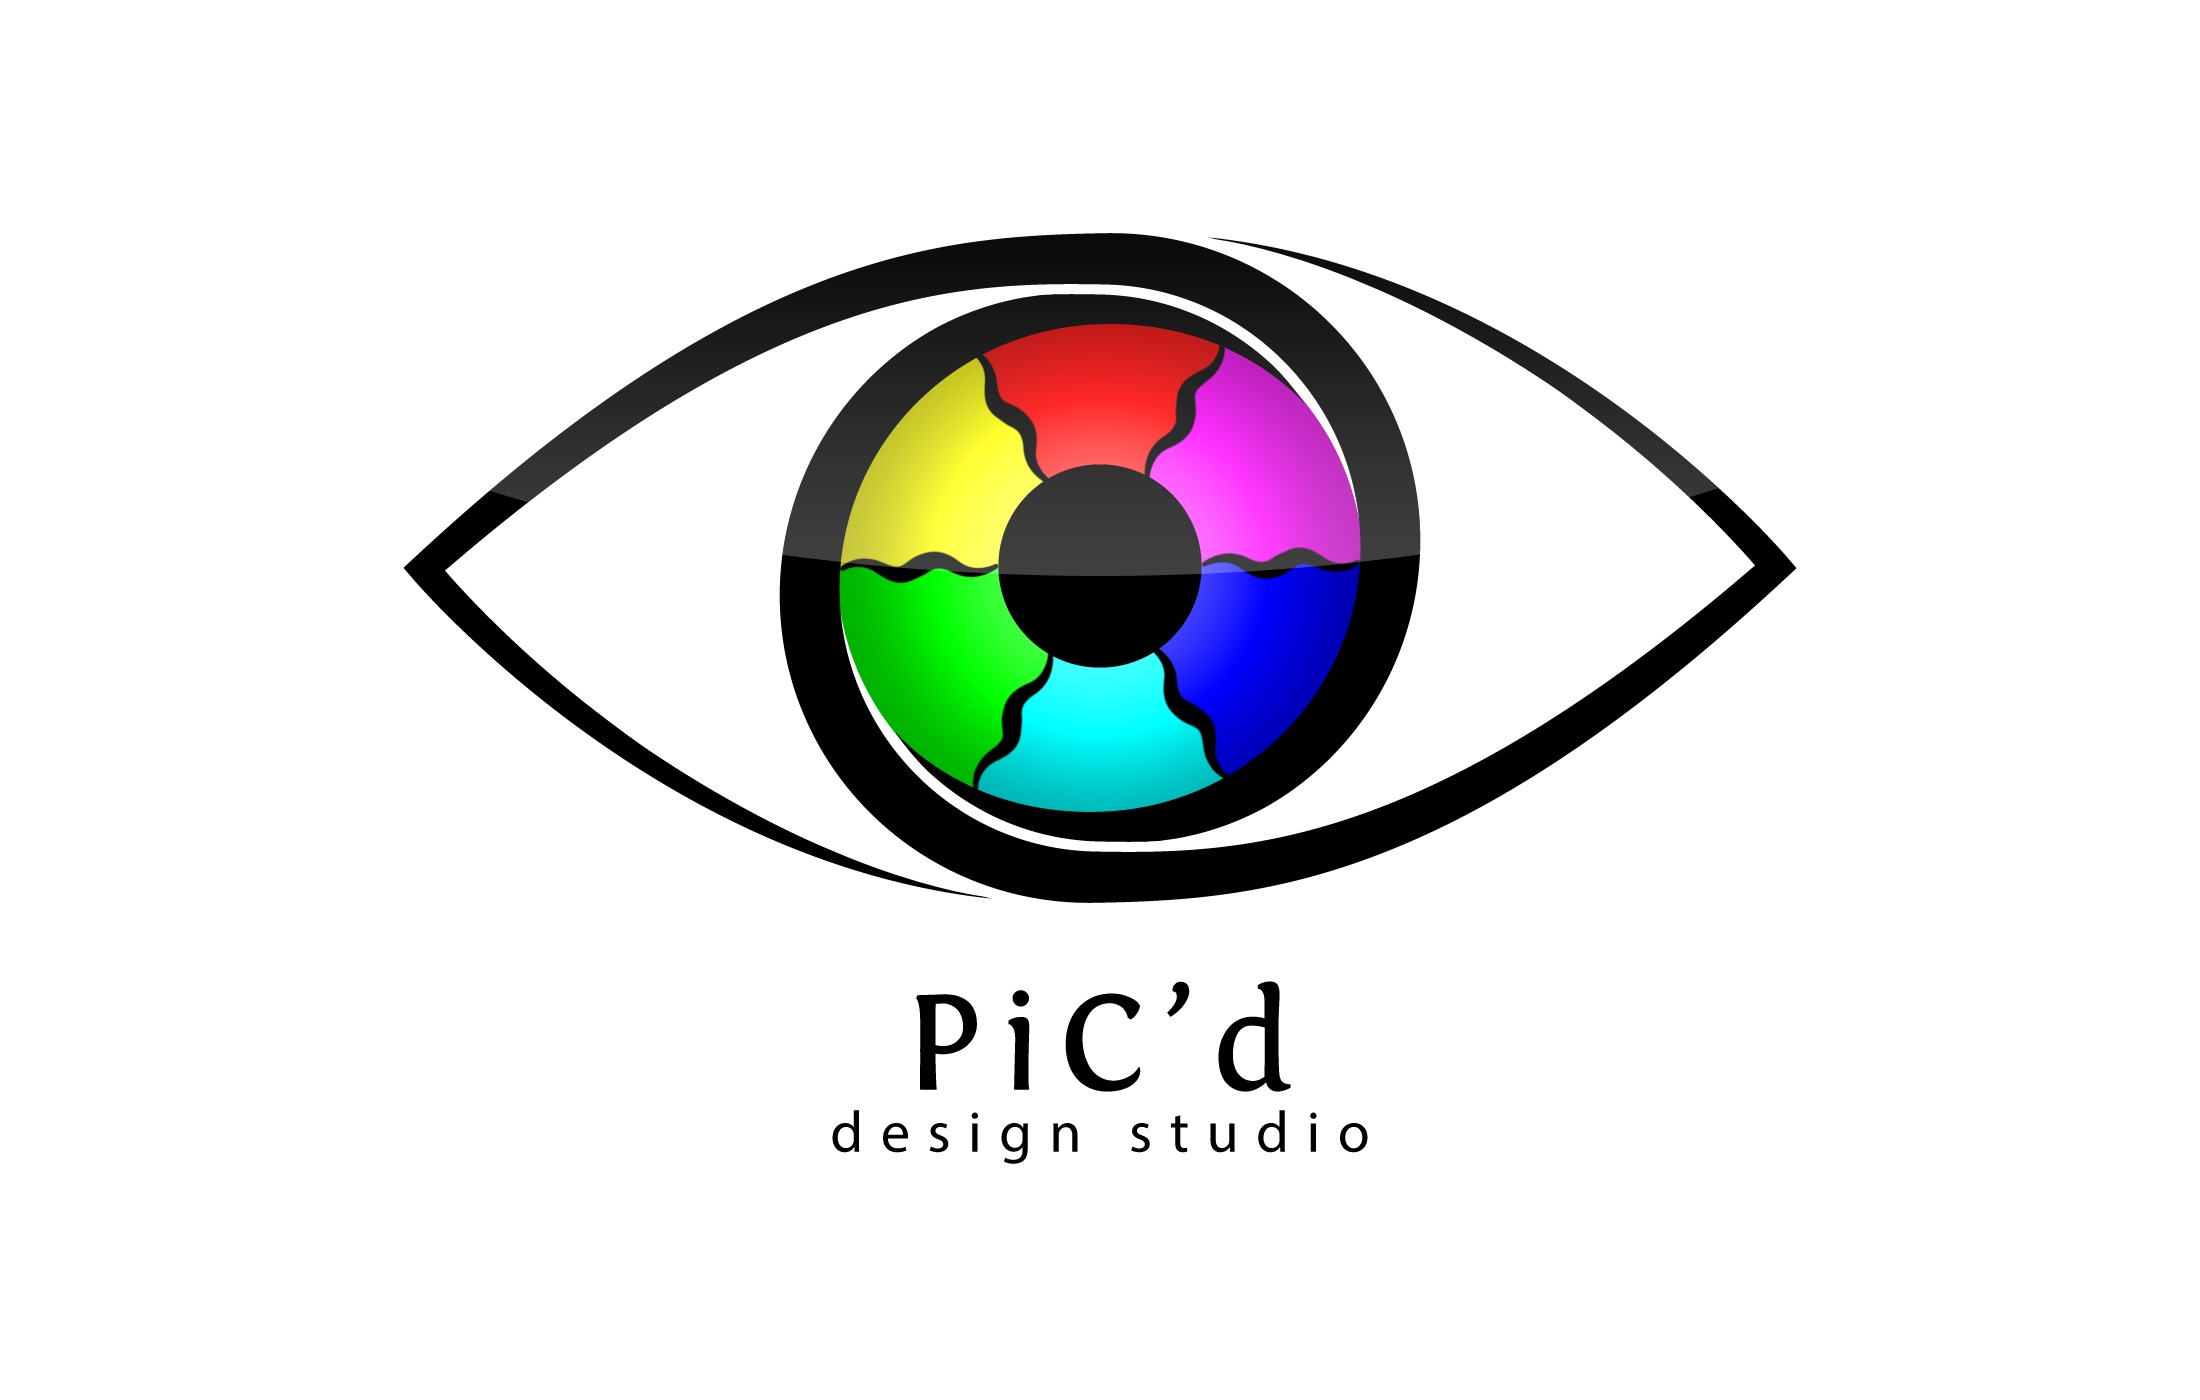 pic d design studio logo by h4all designs interfaces logos logotypes ...